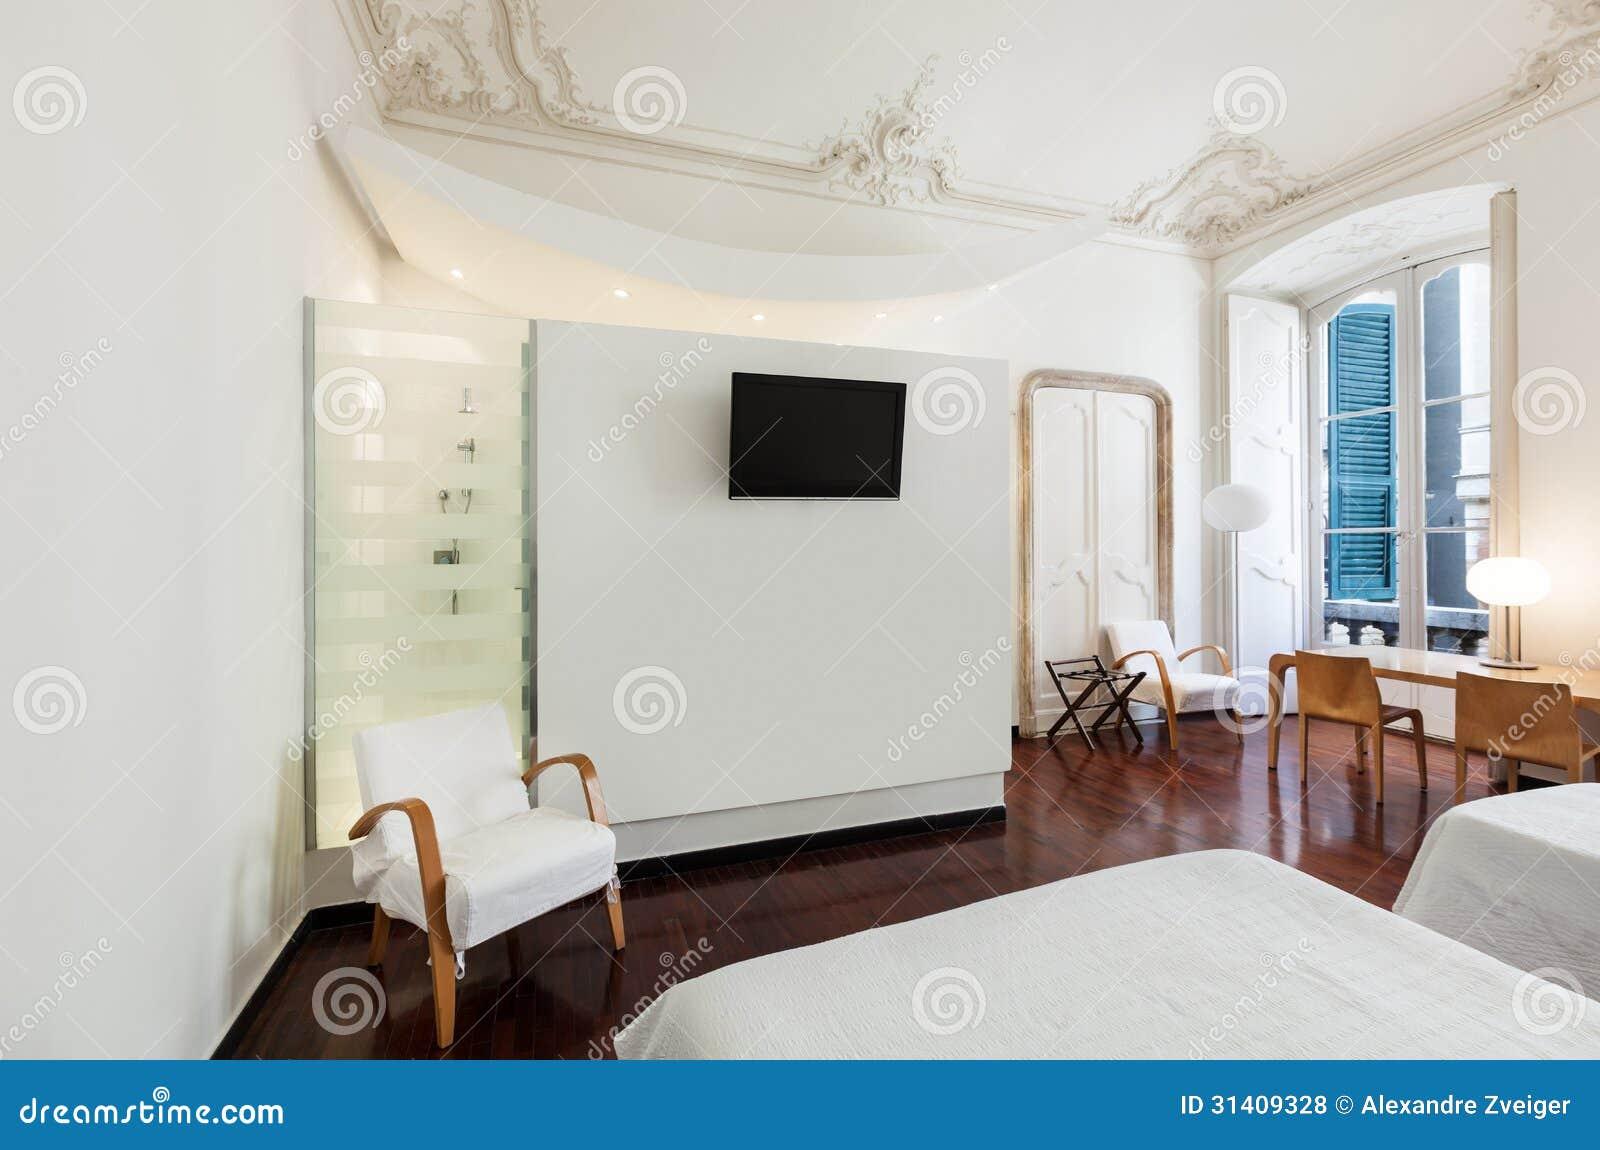 Beautiful hotel room royalty free stock photos image 31409328 - Beautiful room photos ...